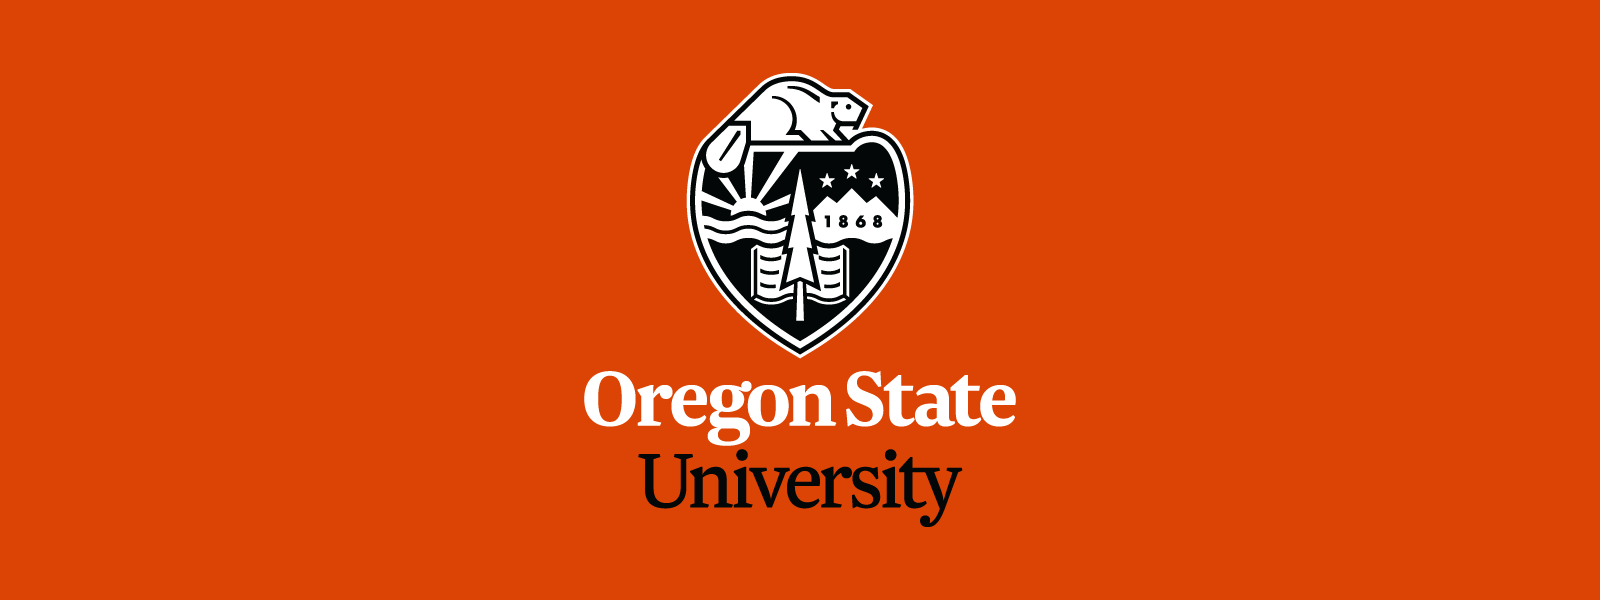 Oregon State Univeristy - Institutional Crest